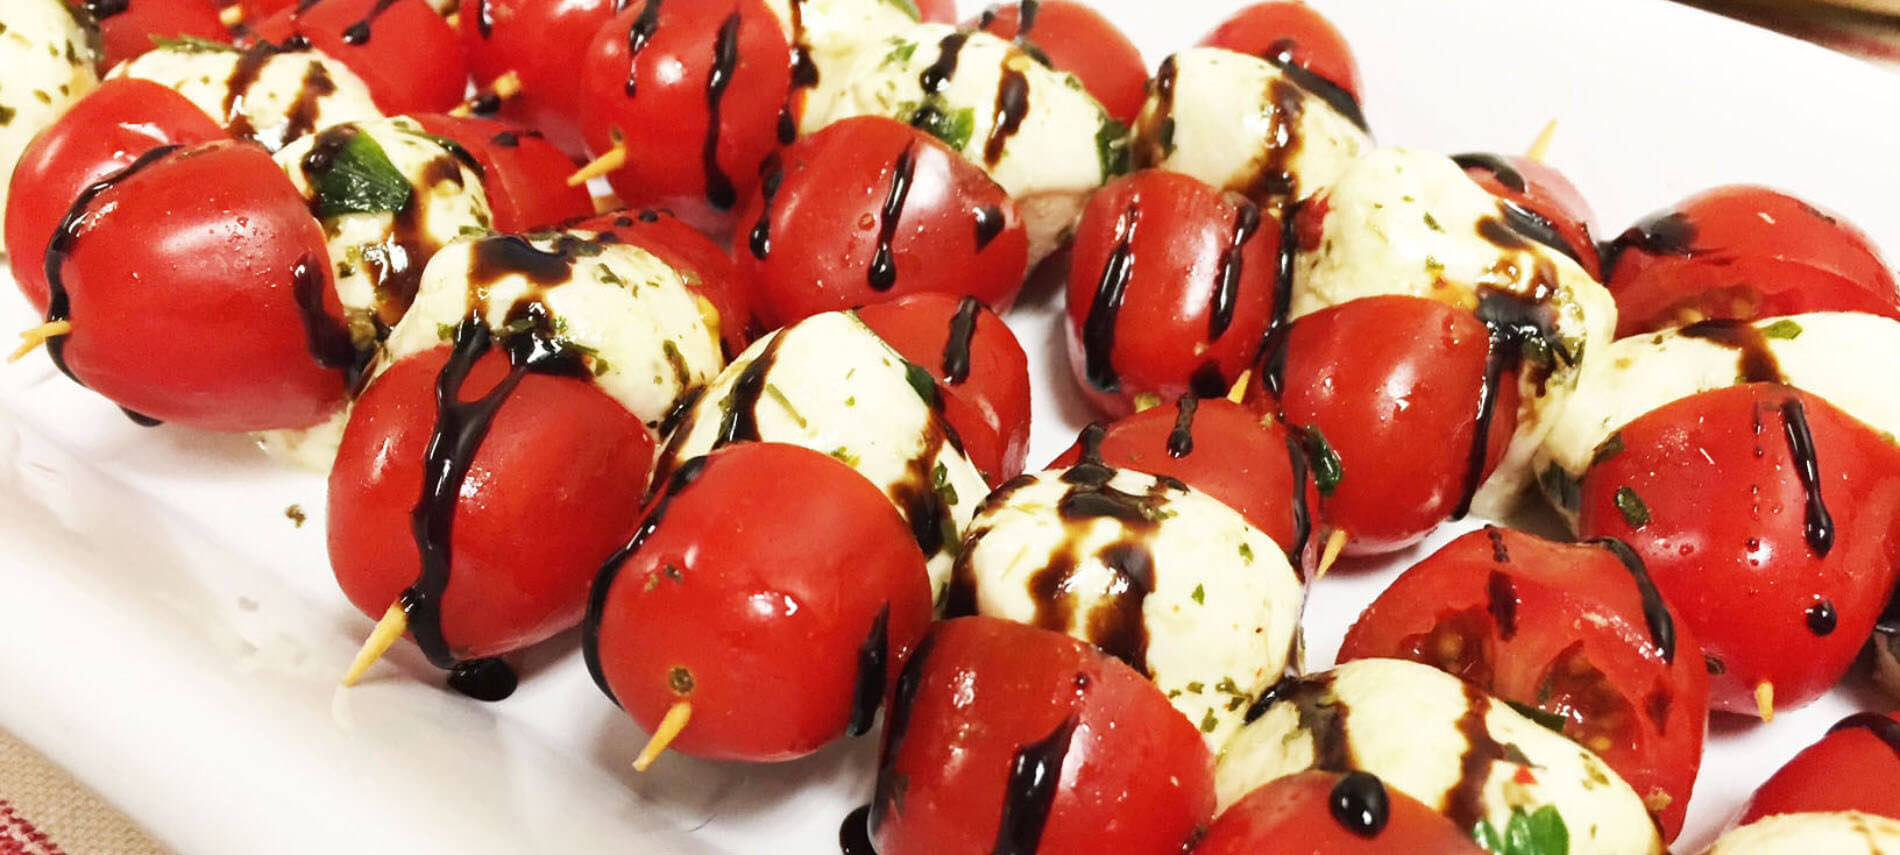 Mozzarella balls and cherry tomato kebabs with a balsamic glaze